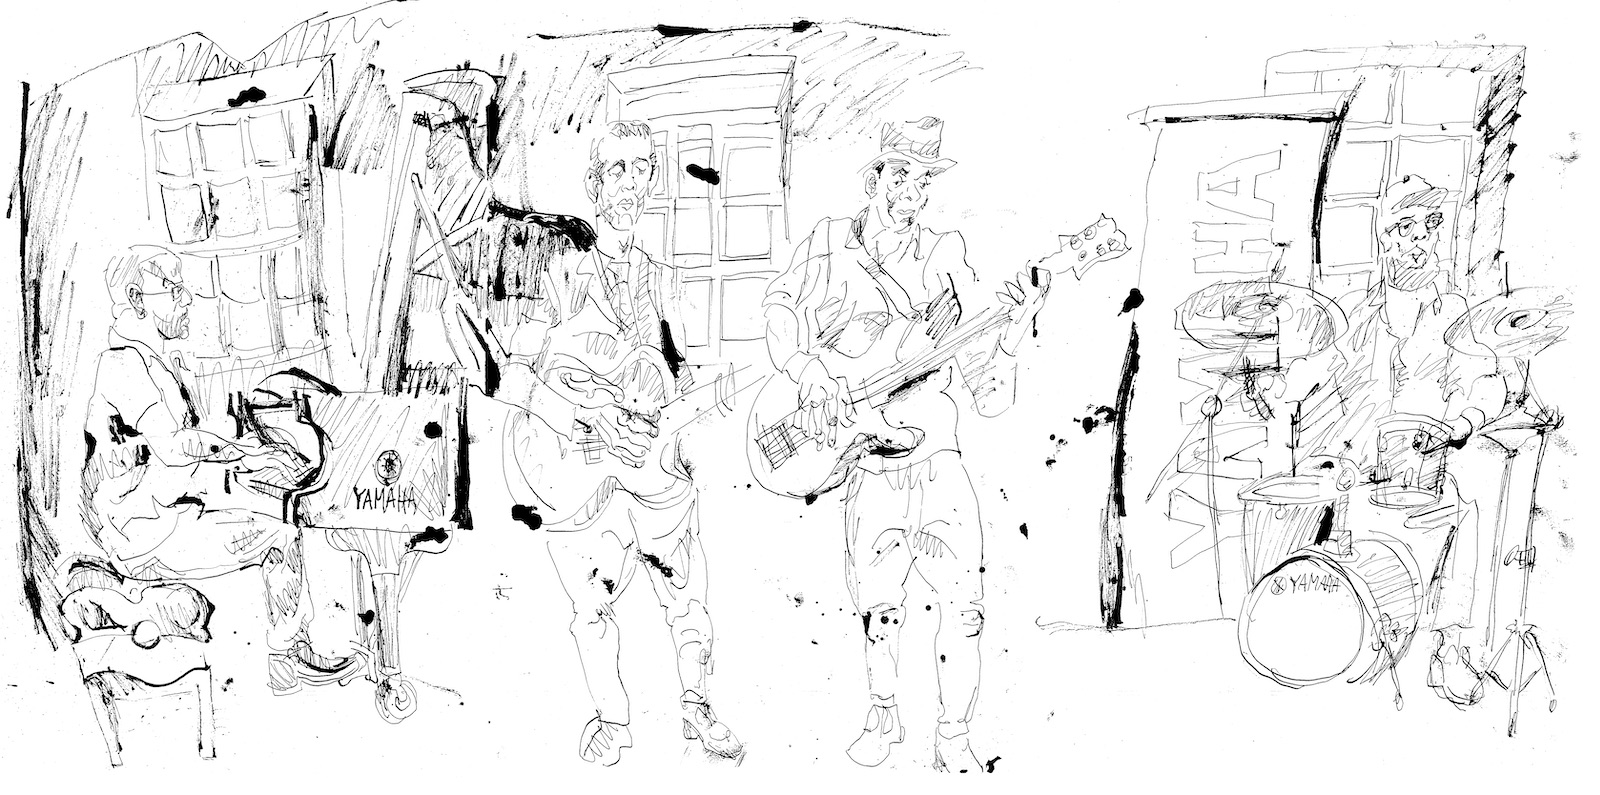 Richie goods quartet at yamaha studios